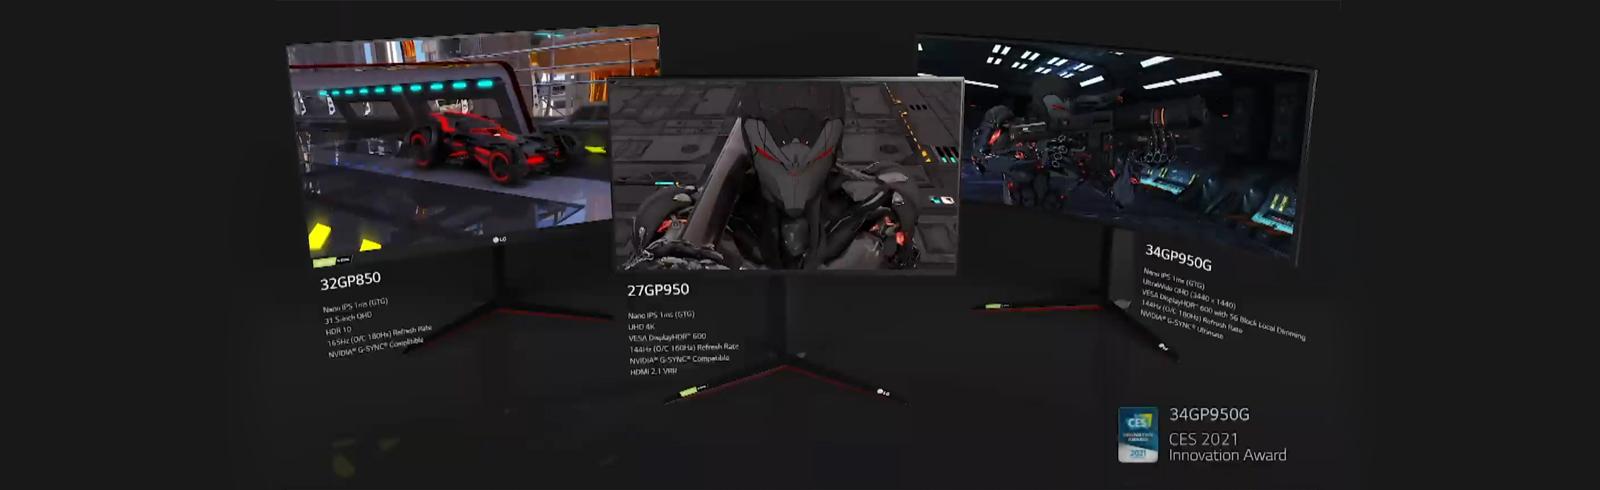 LG unveils the UltraGear 34WP950G, 34GP950 and 32GP850 gaming monitors